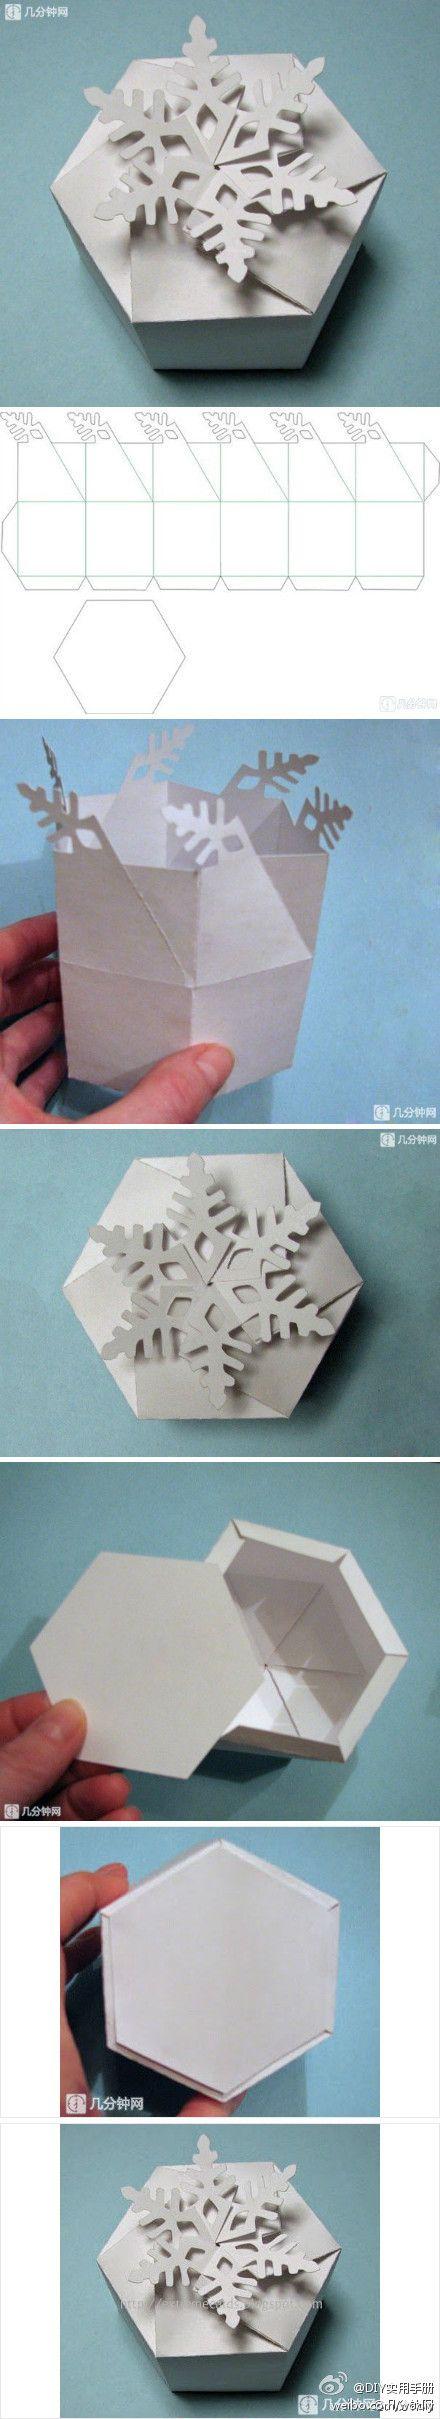 boite - étoile de neige folding snowflake box